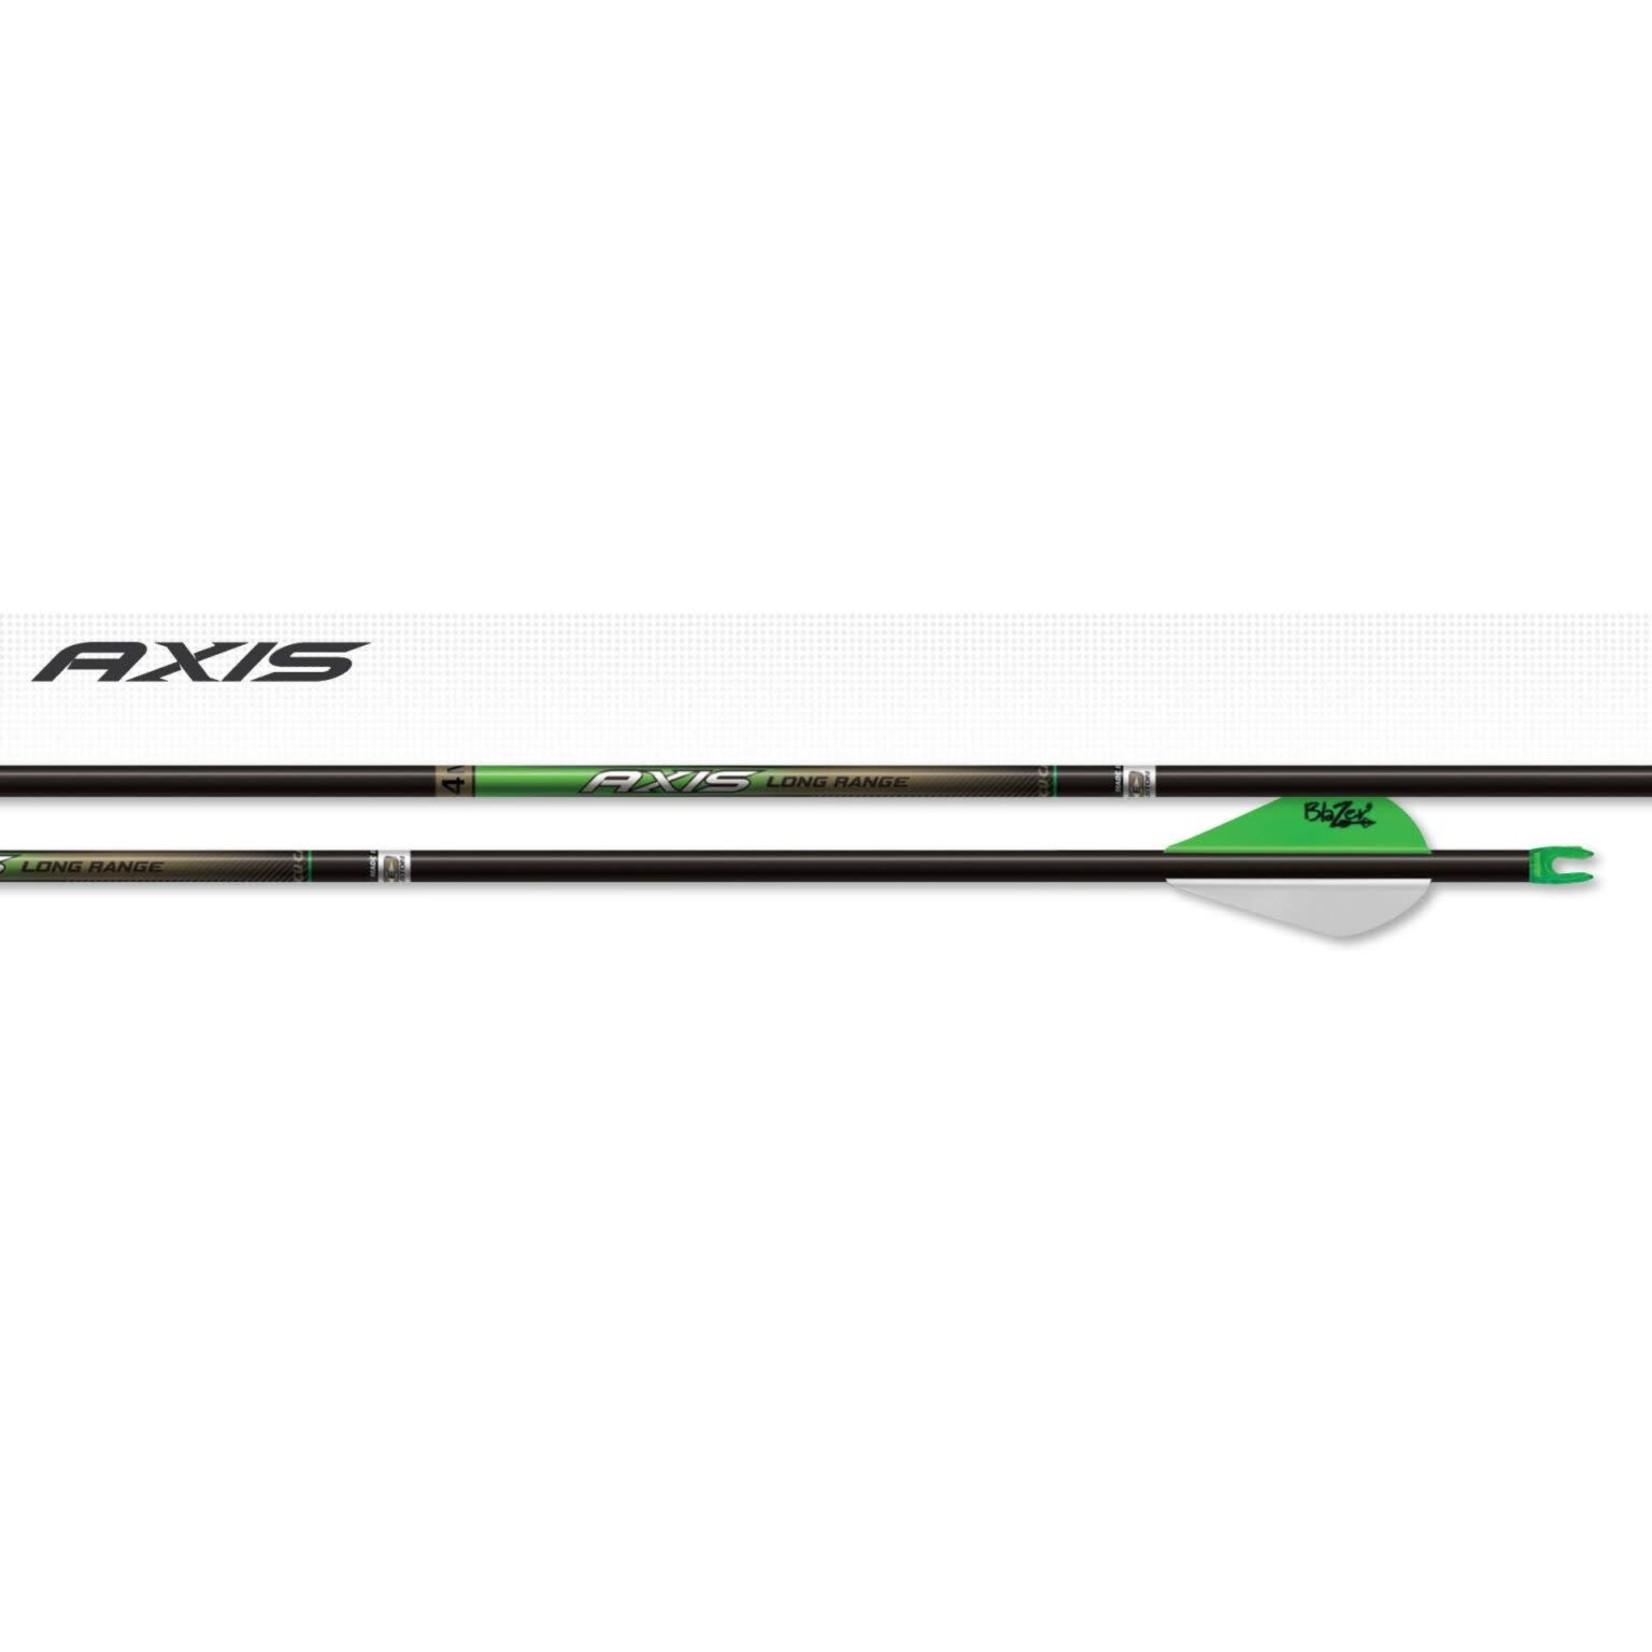 Easton Easton Axis Long Range 4mm Arrow Shafts 300 (1/2 doz)